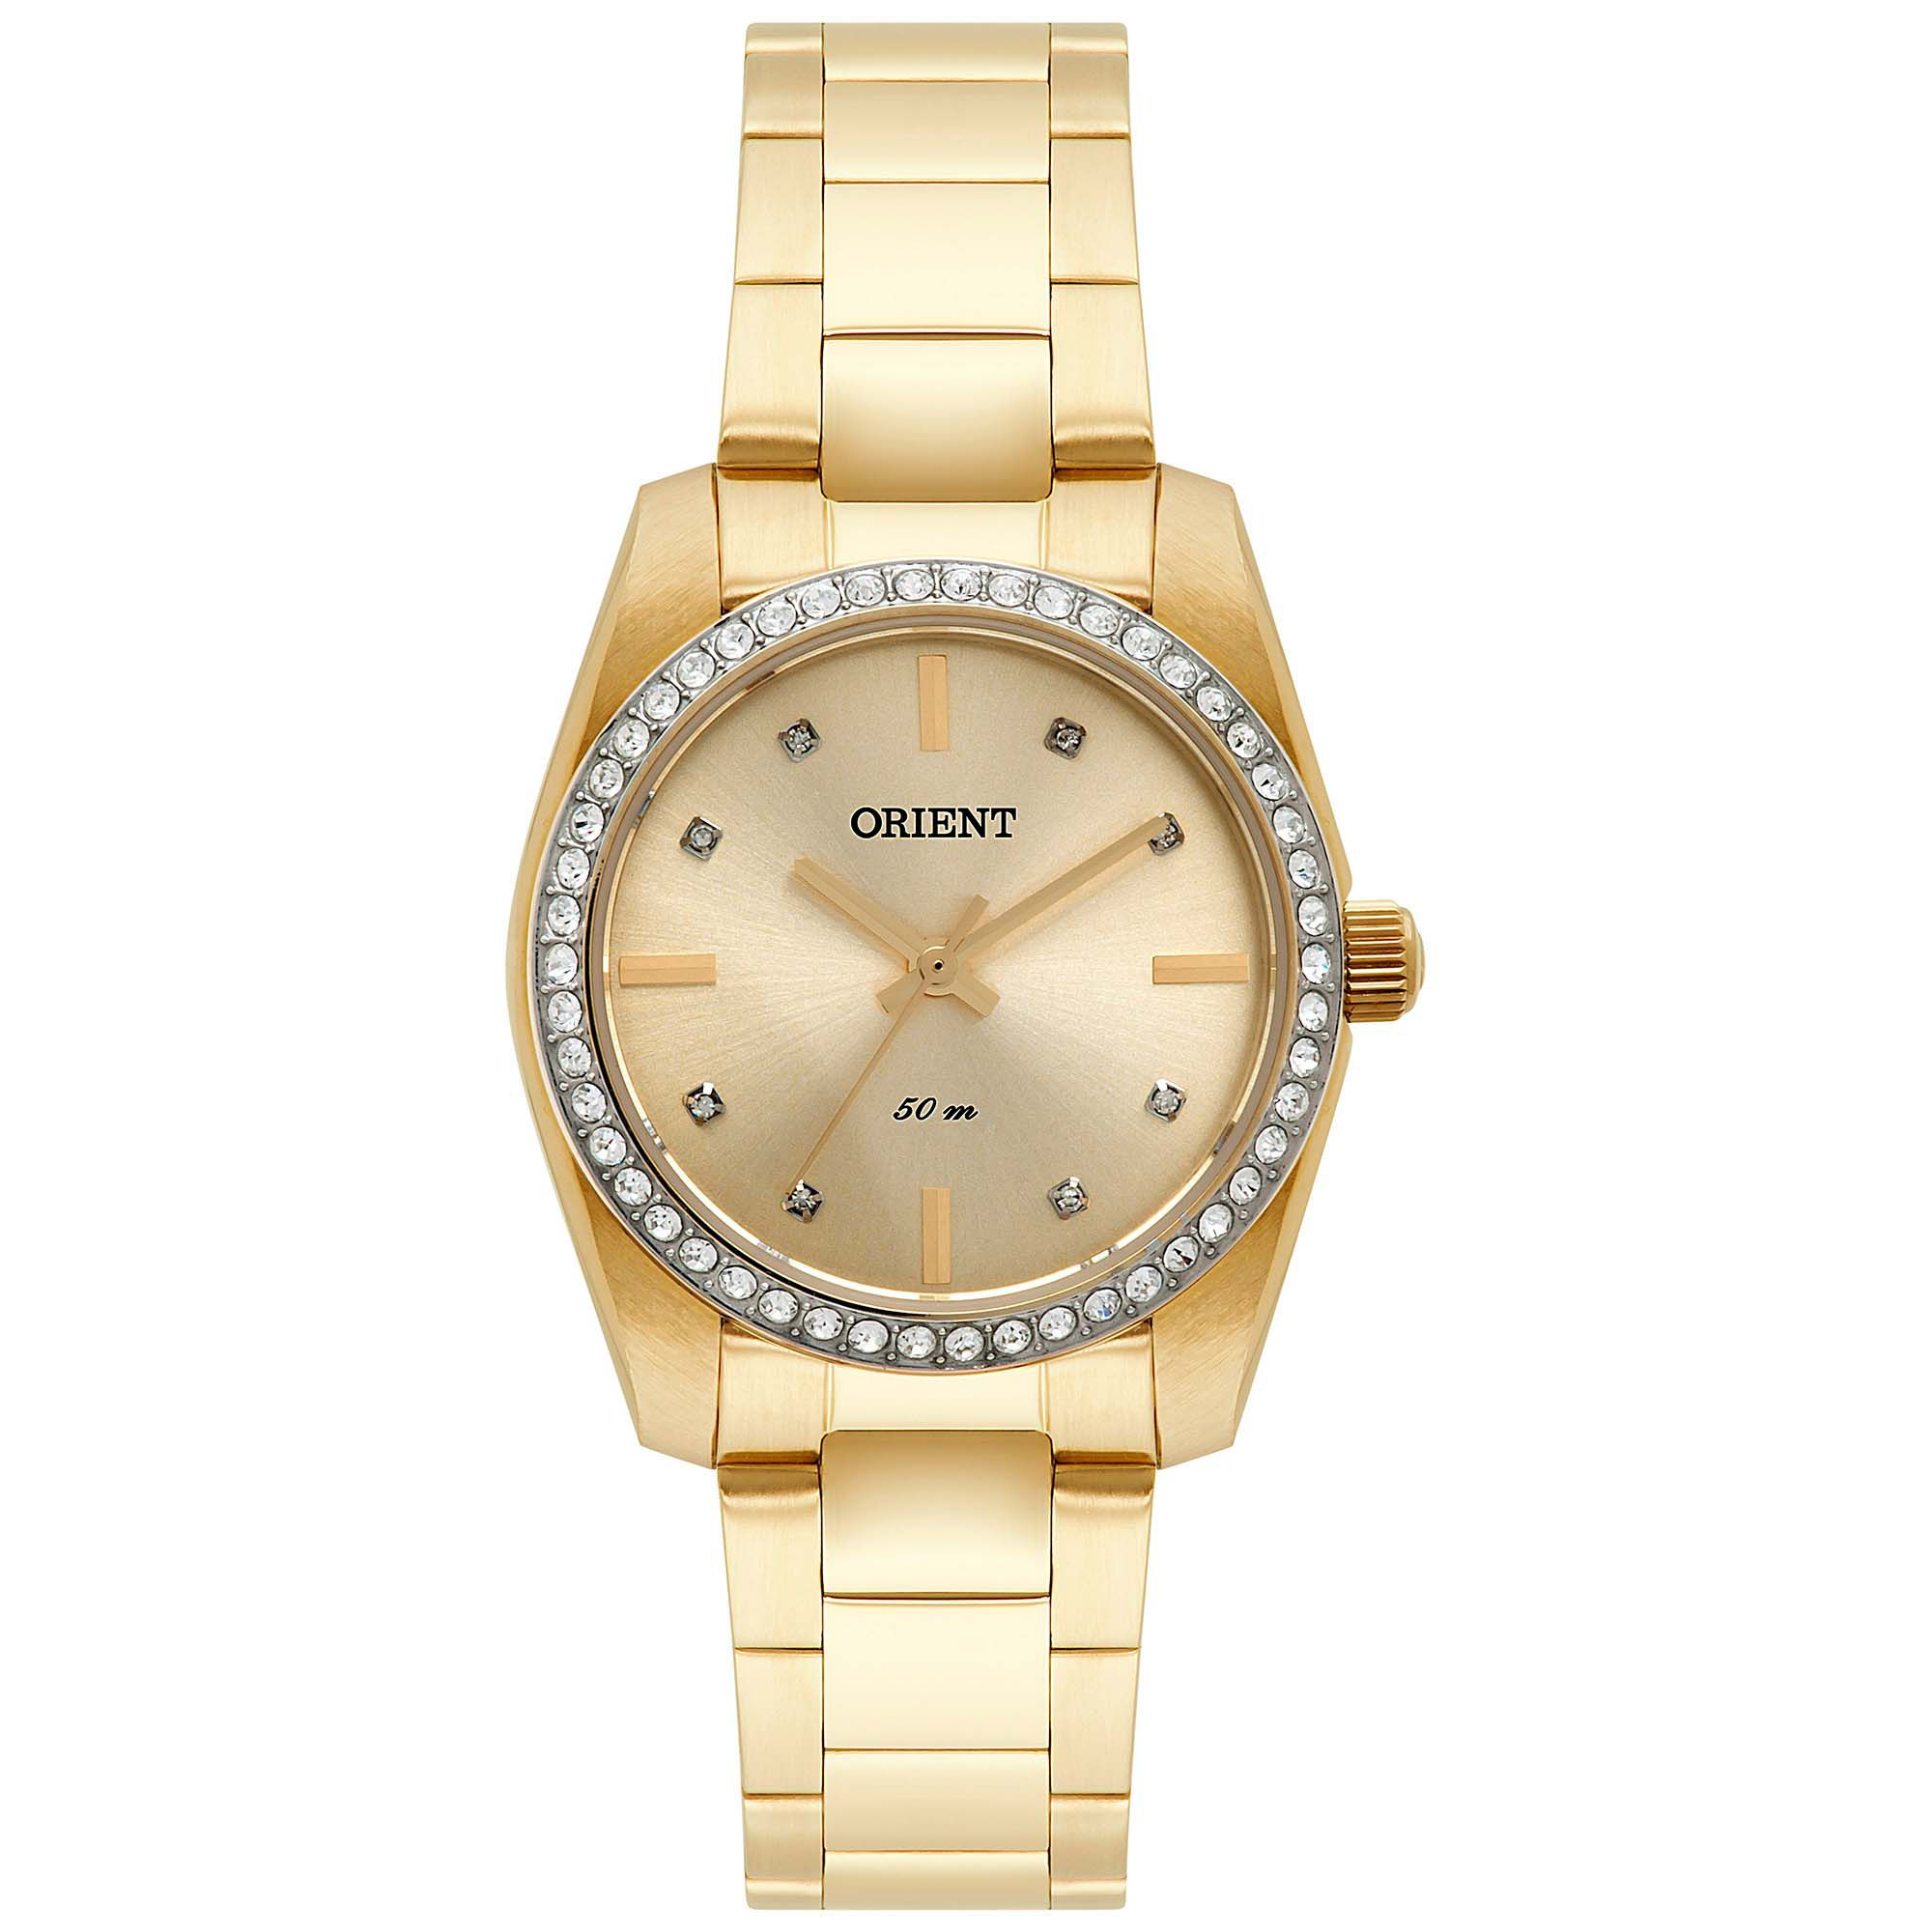 Relógio Feminino Orient FGSS0078 C1KX